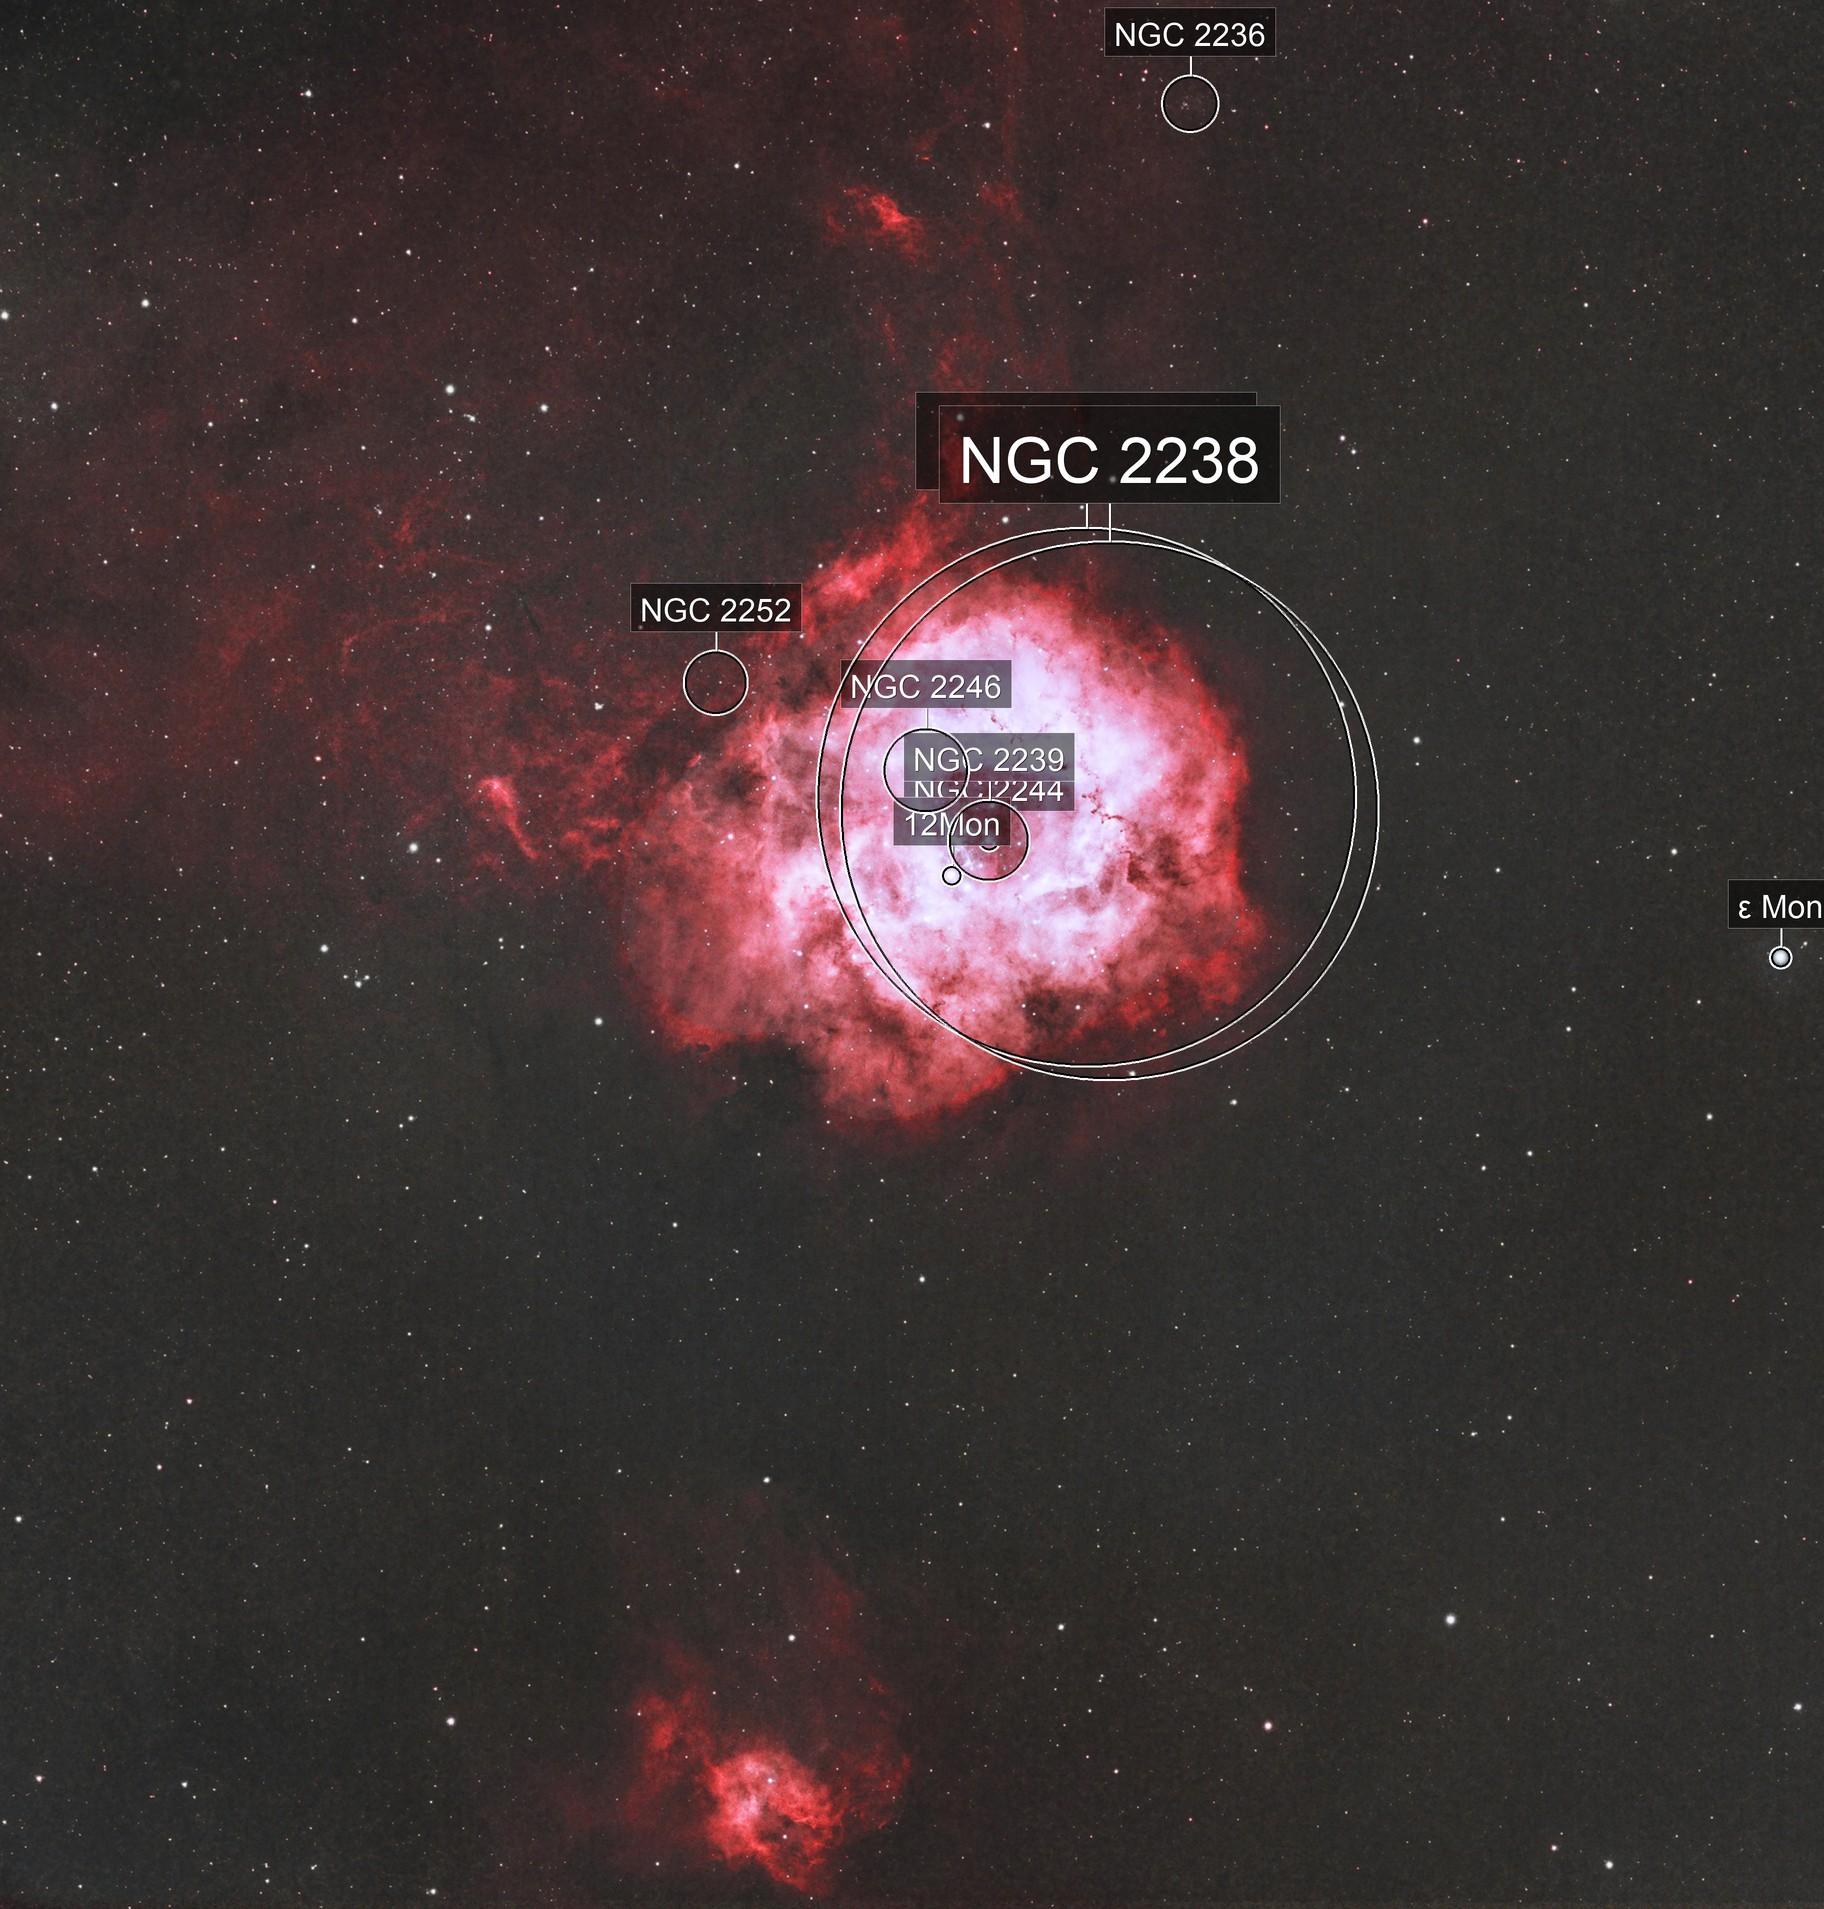 Rosette Nebula with Sh2-280